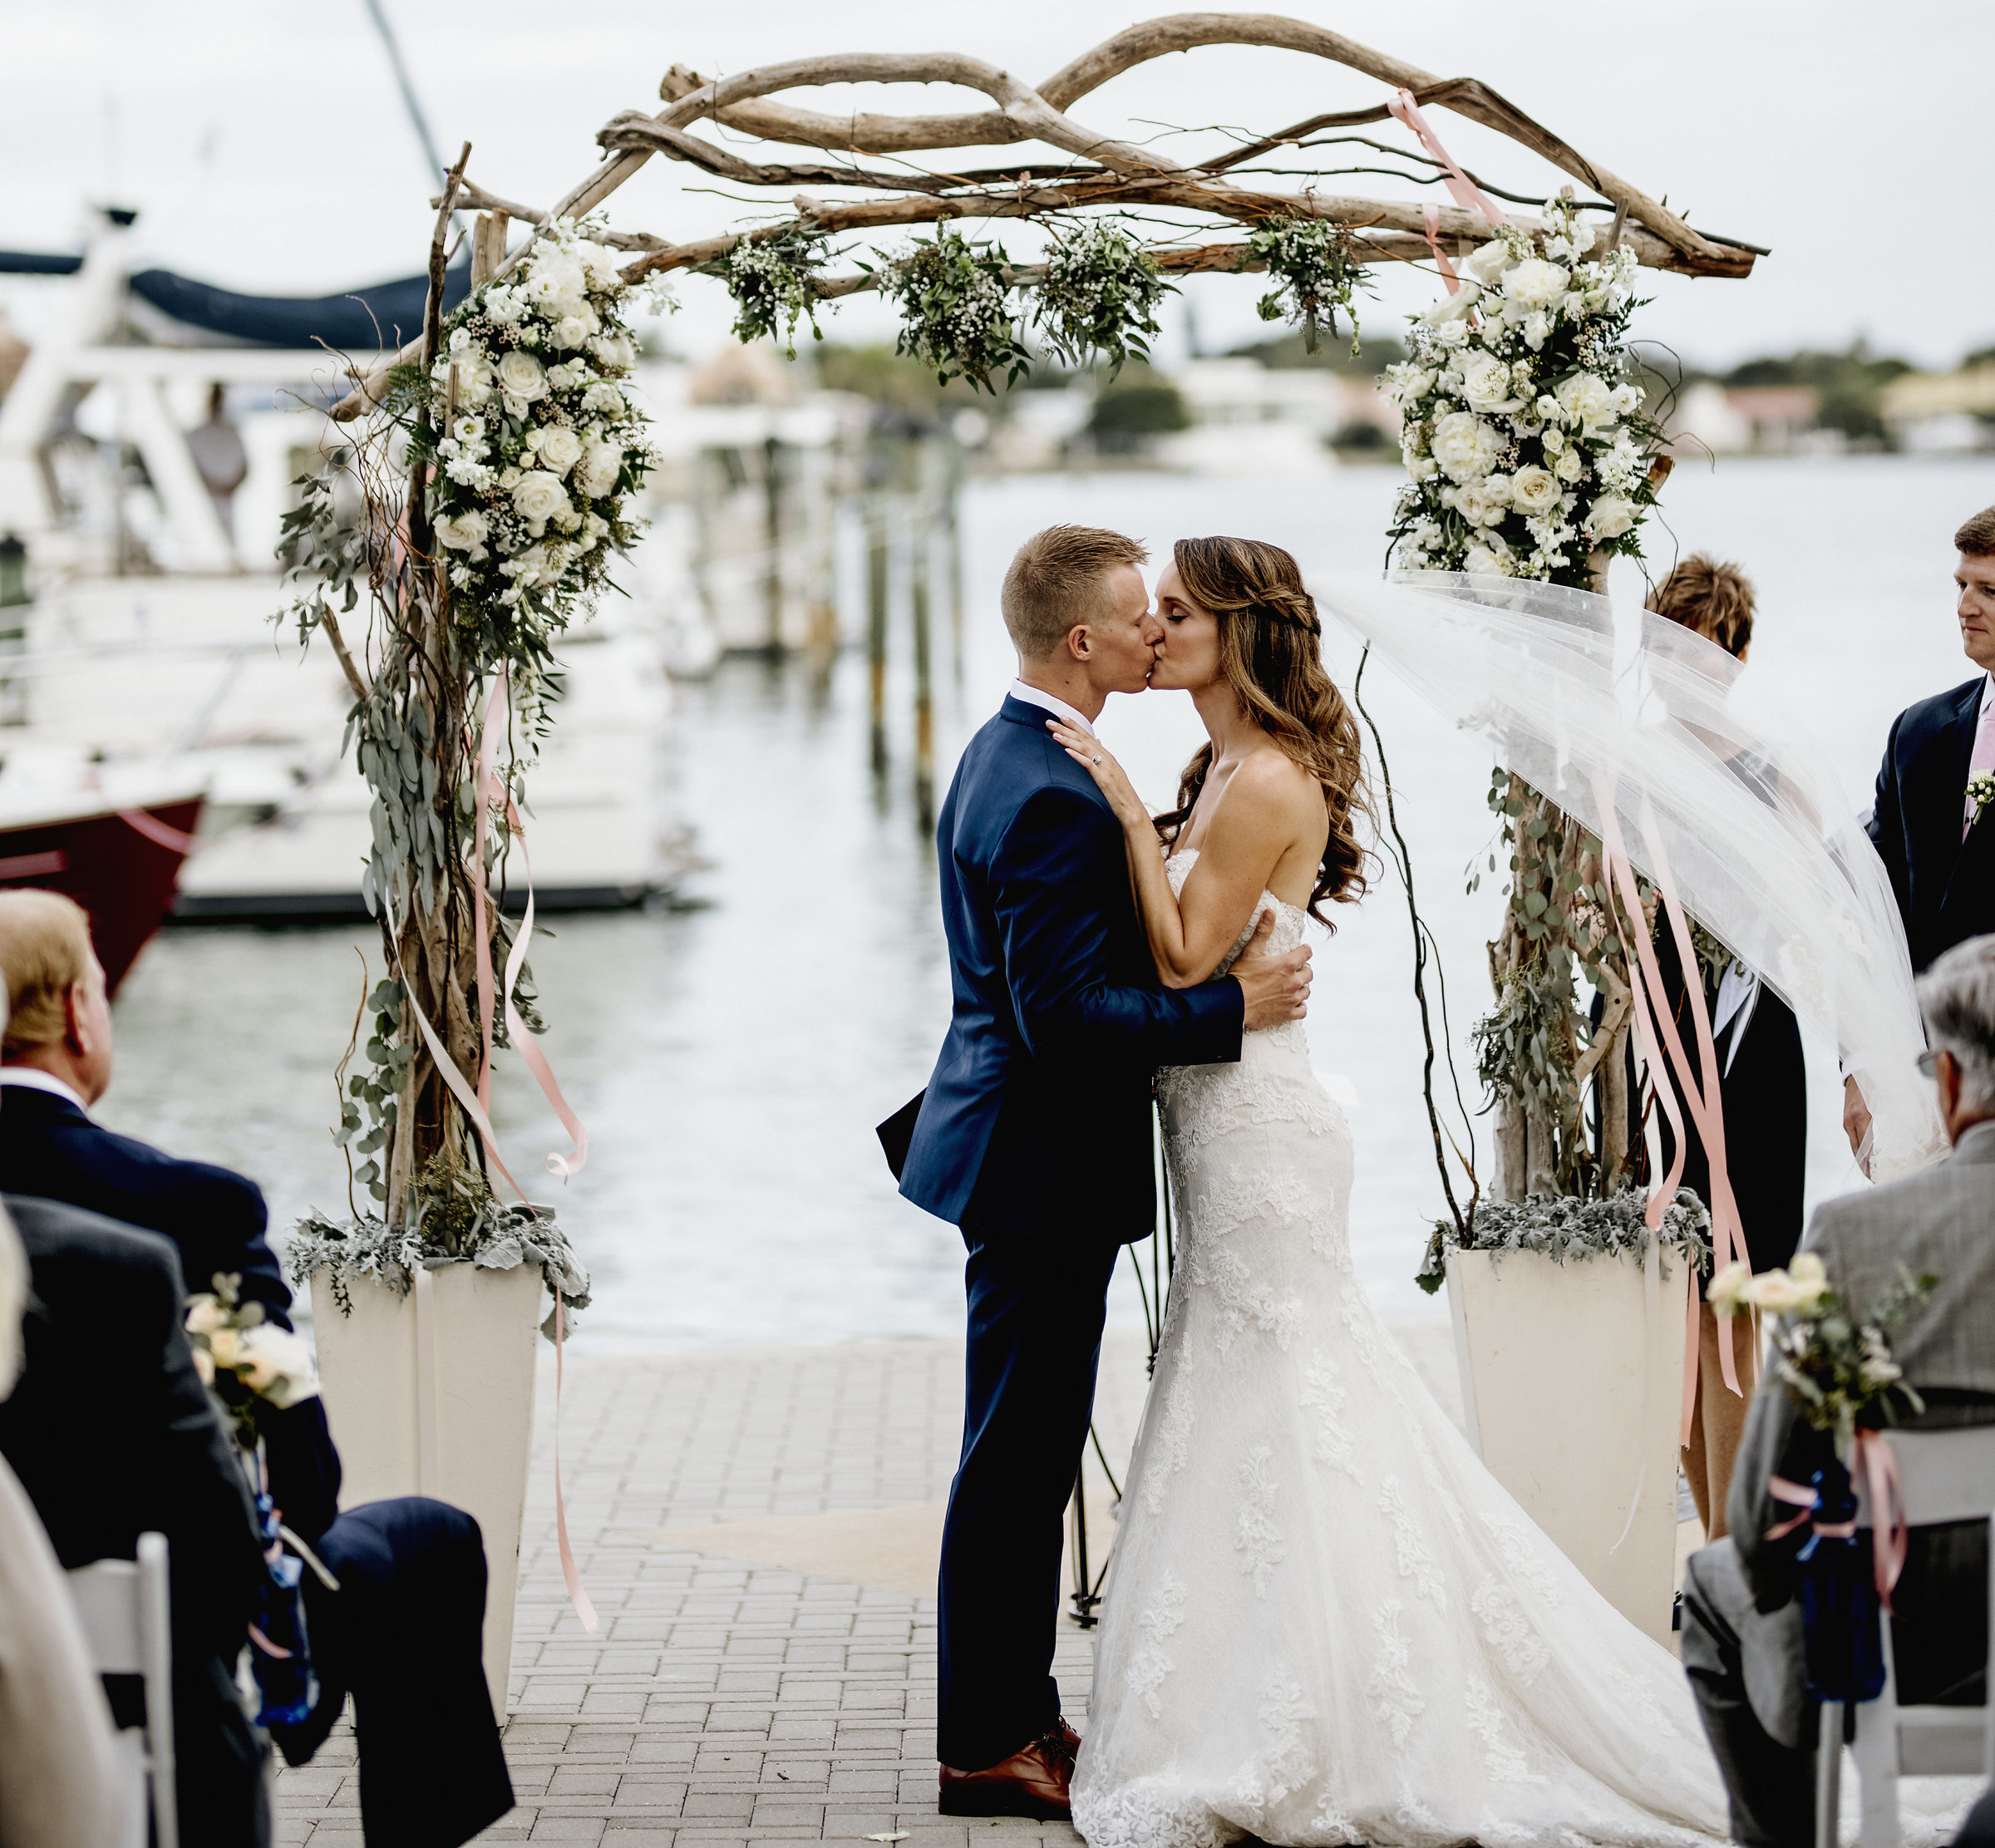 Laura Fletchers Wedding At The Sarasota Yacht Club